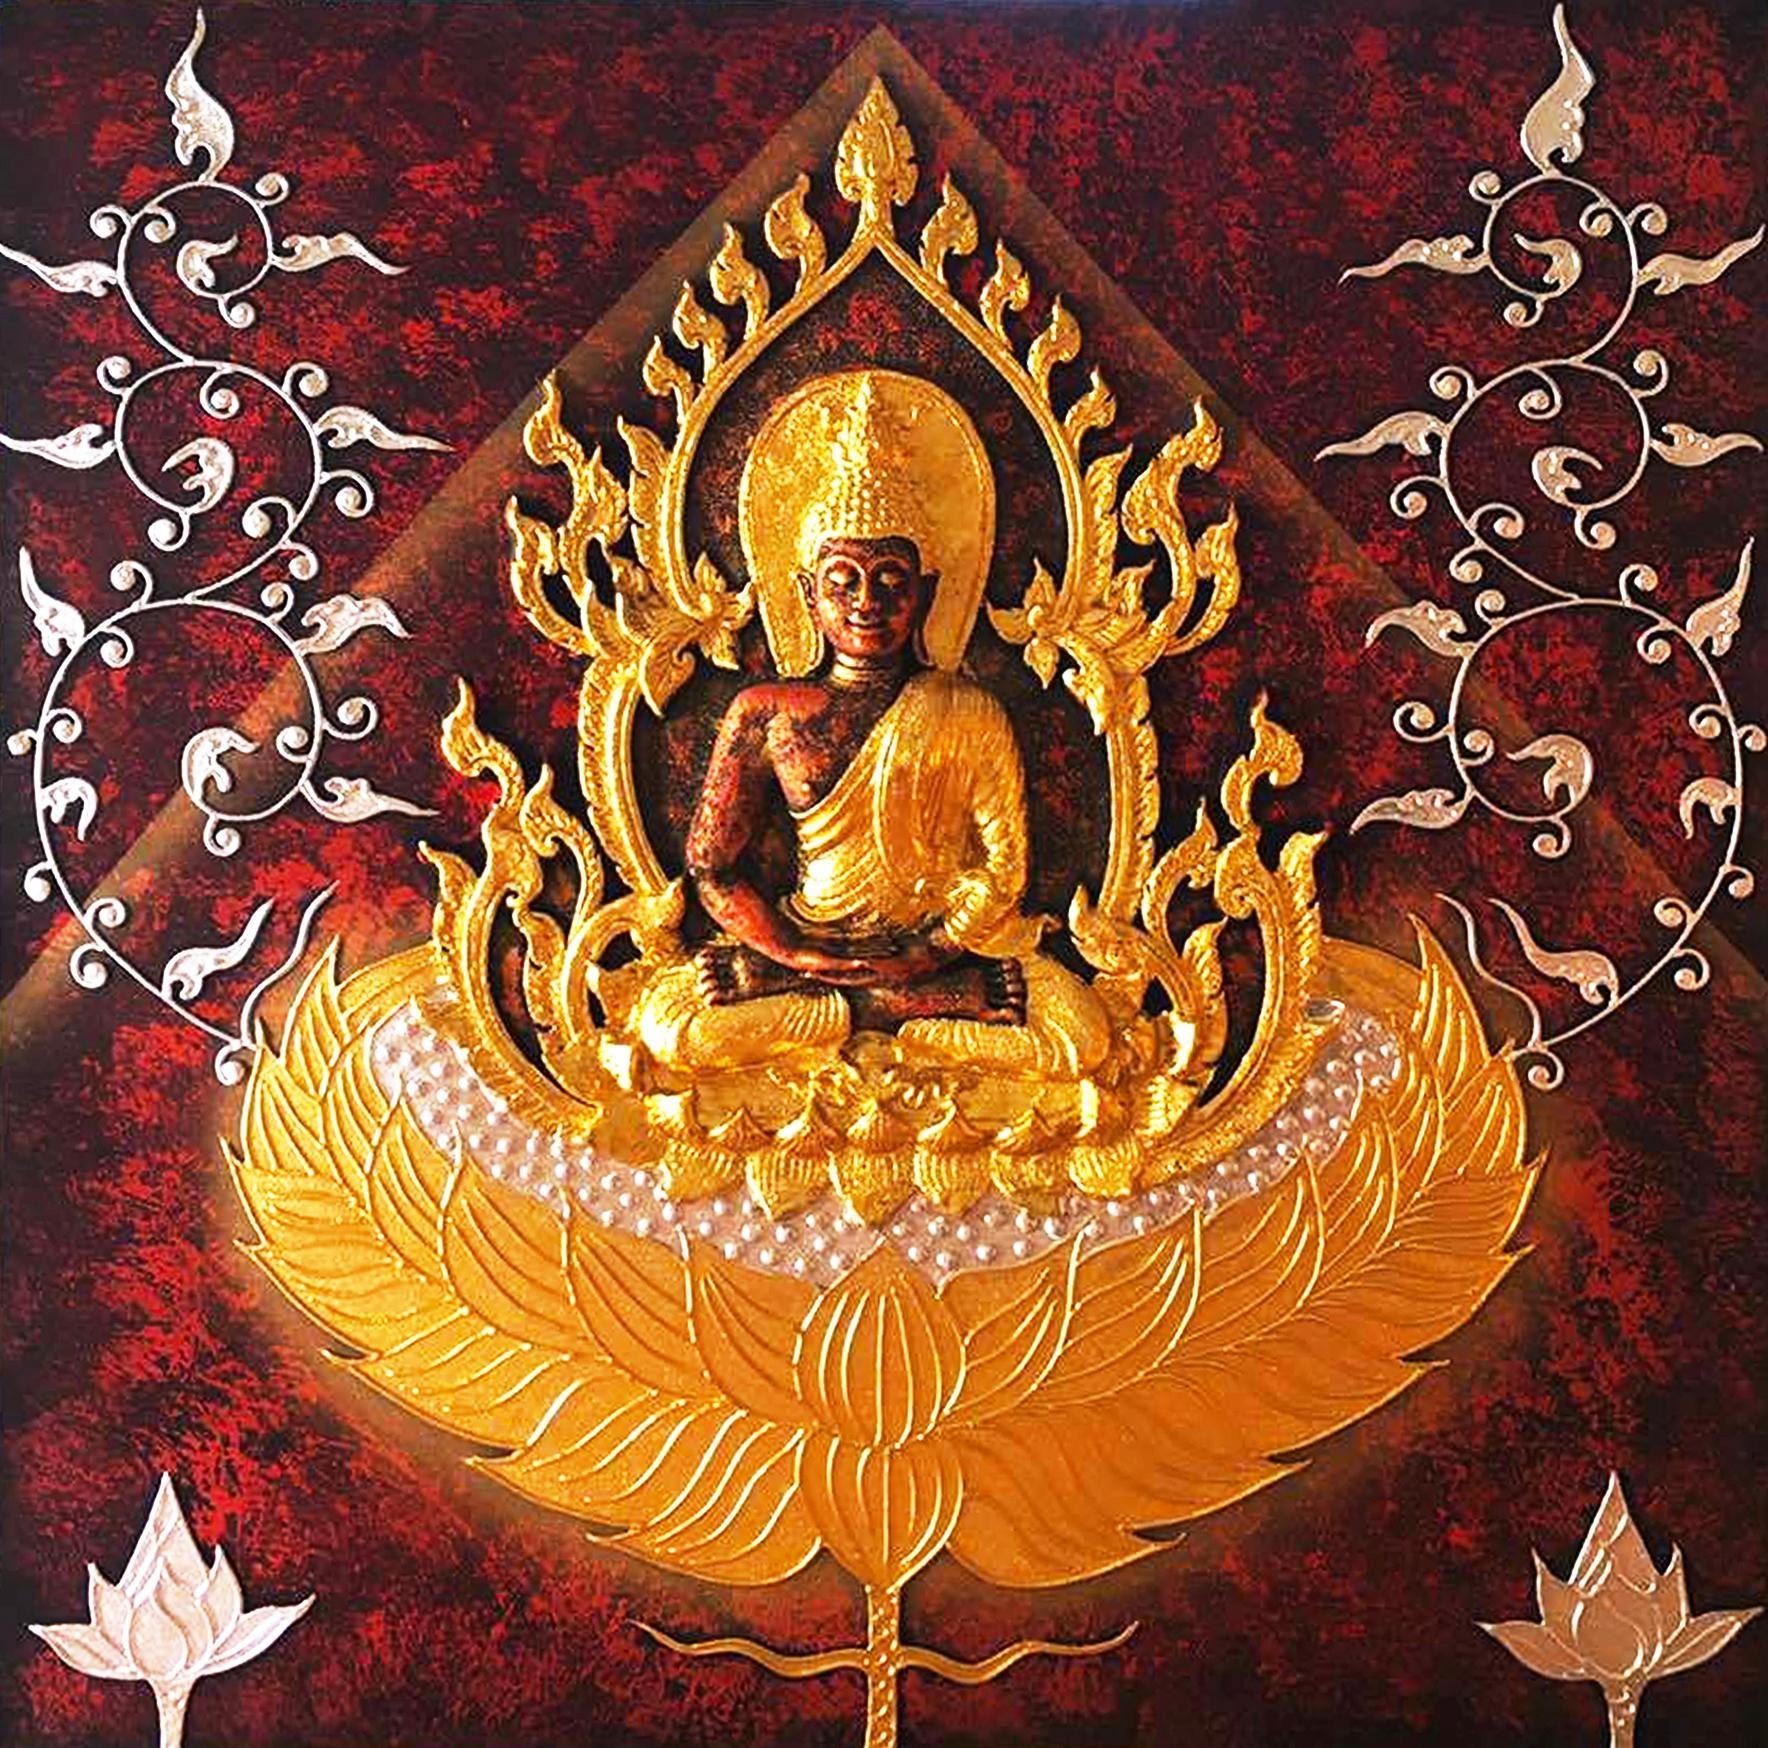 Buddha Painting 3D Handmade Gold Statue | Royal Thai Art With Buddha Wooden Wall Art (View 19 of 20)